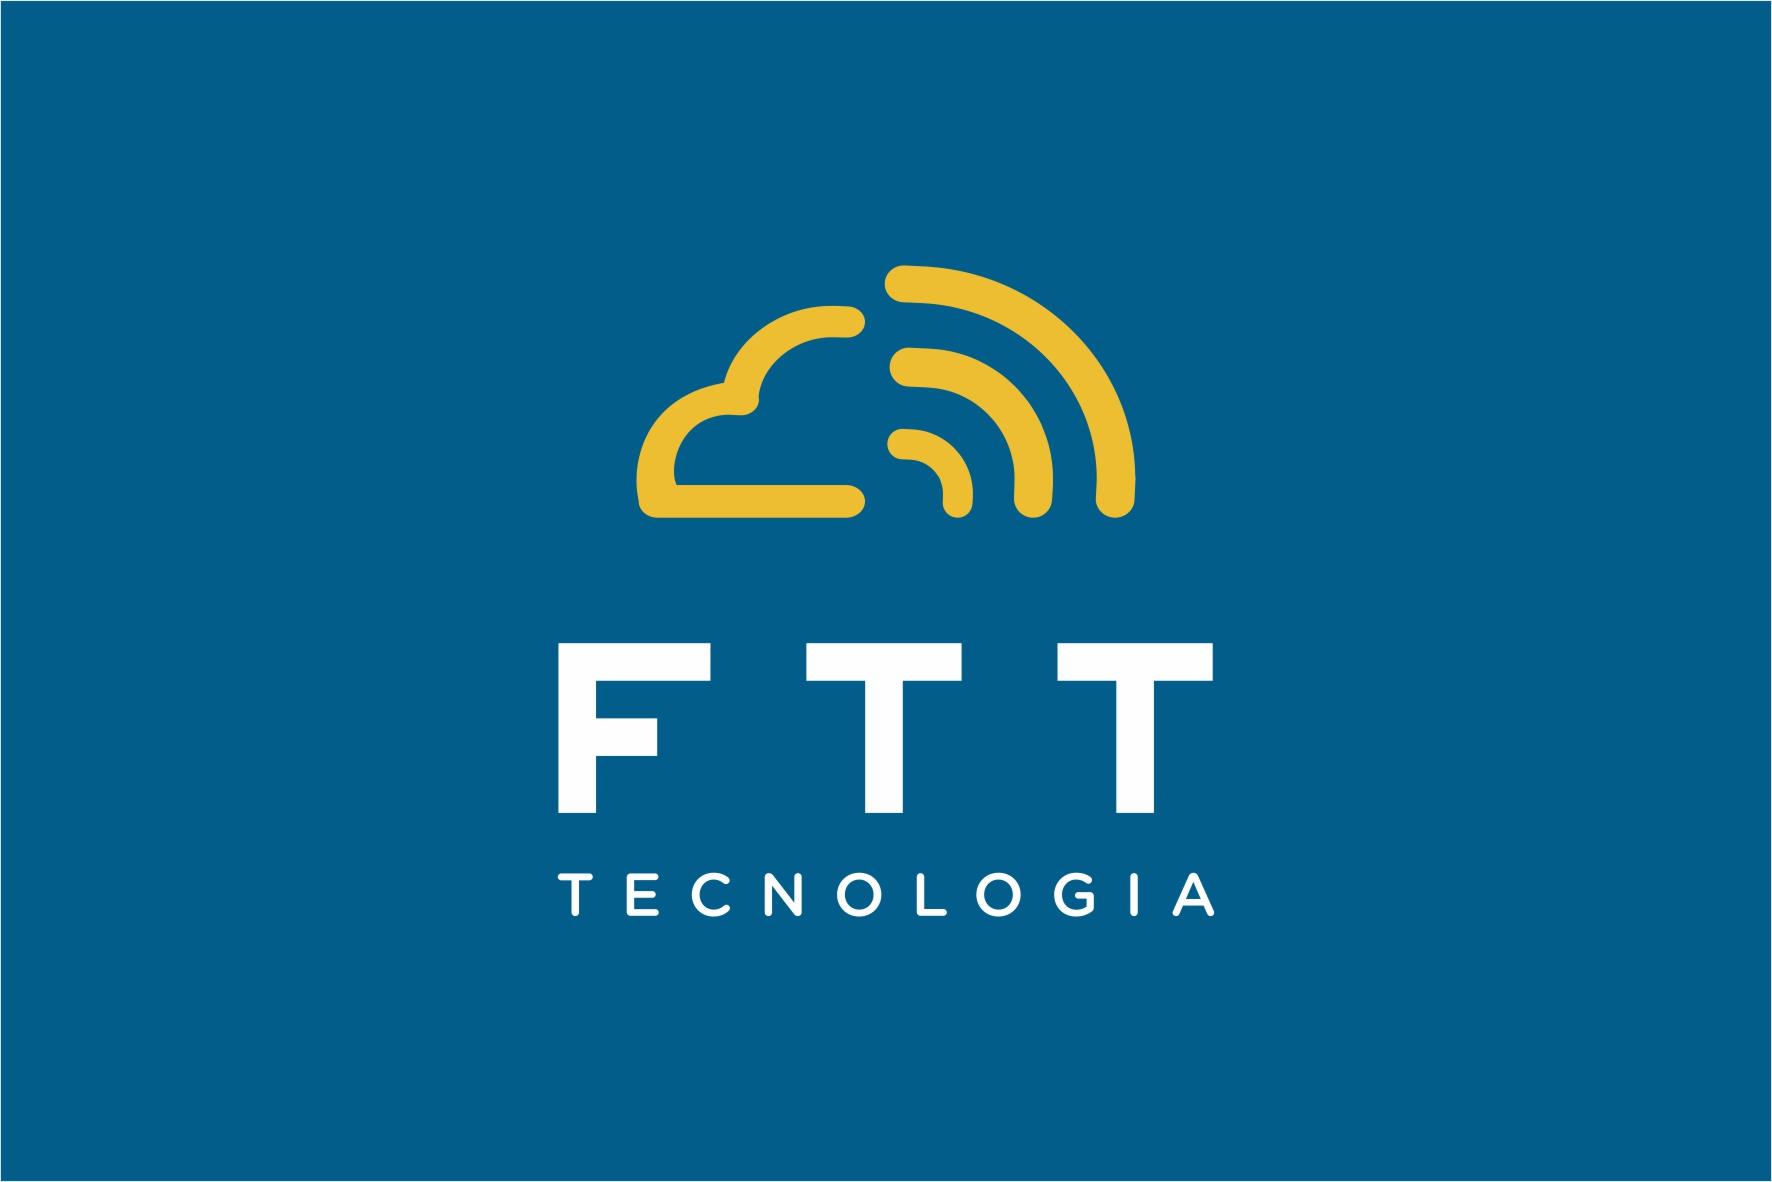 FTT TECNOLOGIA